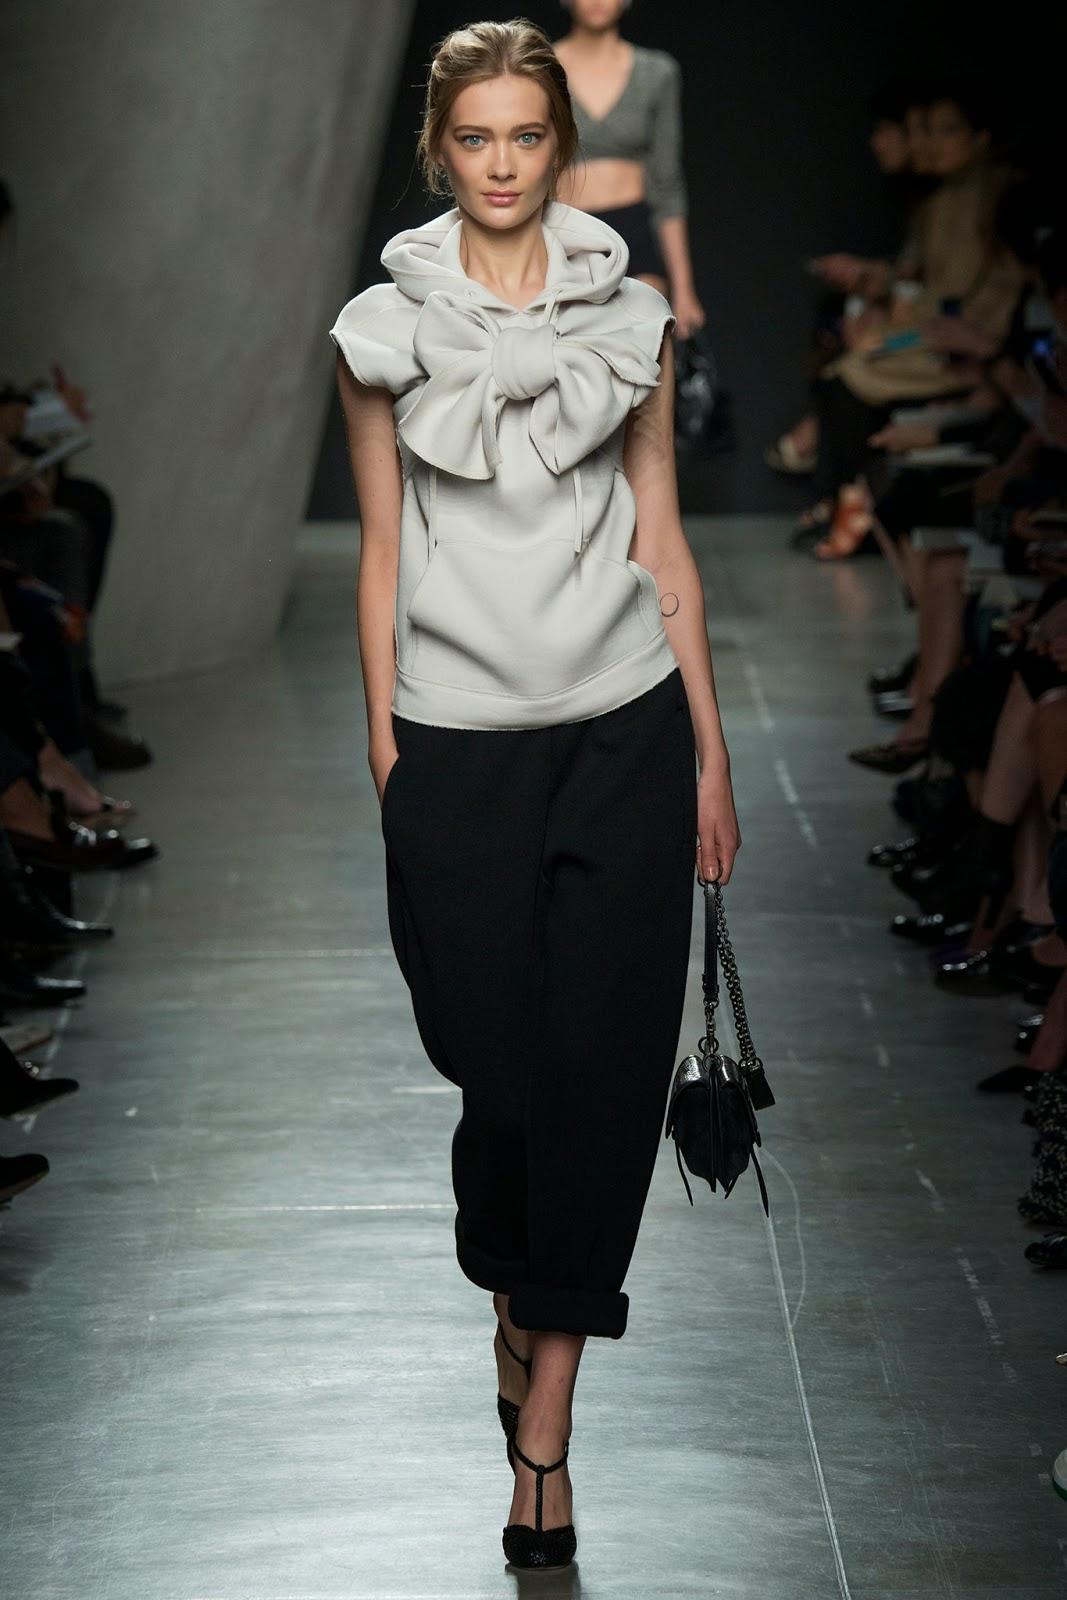 44074be4fd0 Fashion Runway   Bottega Veneta Spring 2015 Ready-to-Wear   Cool ...